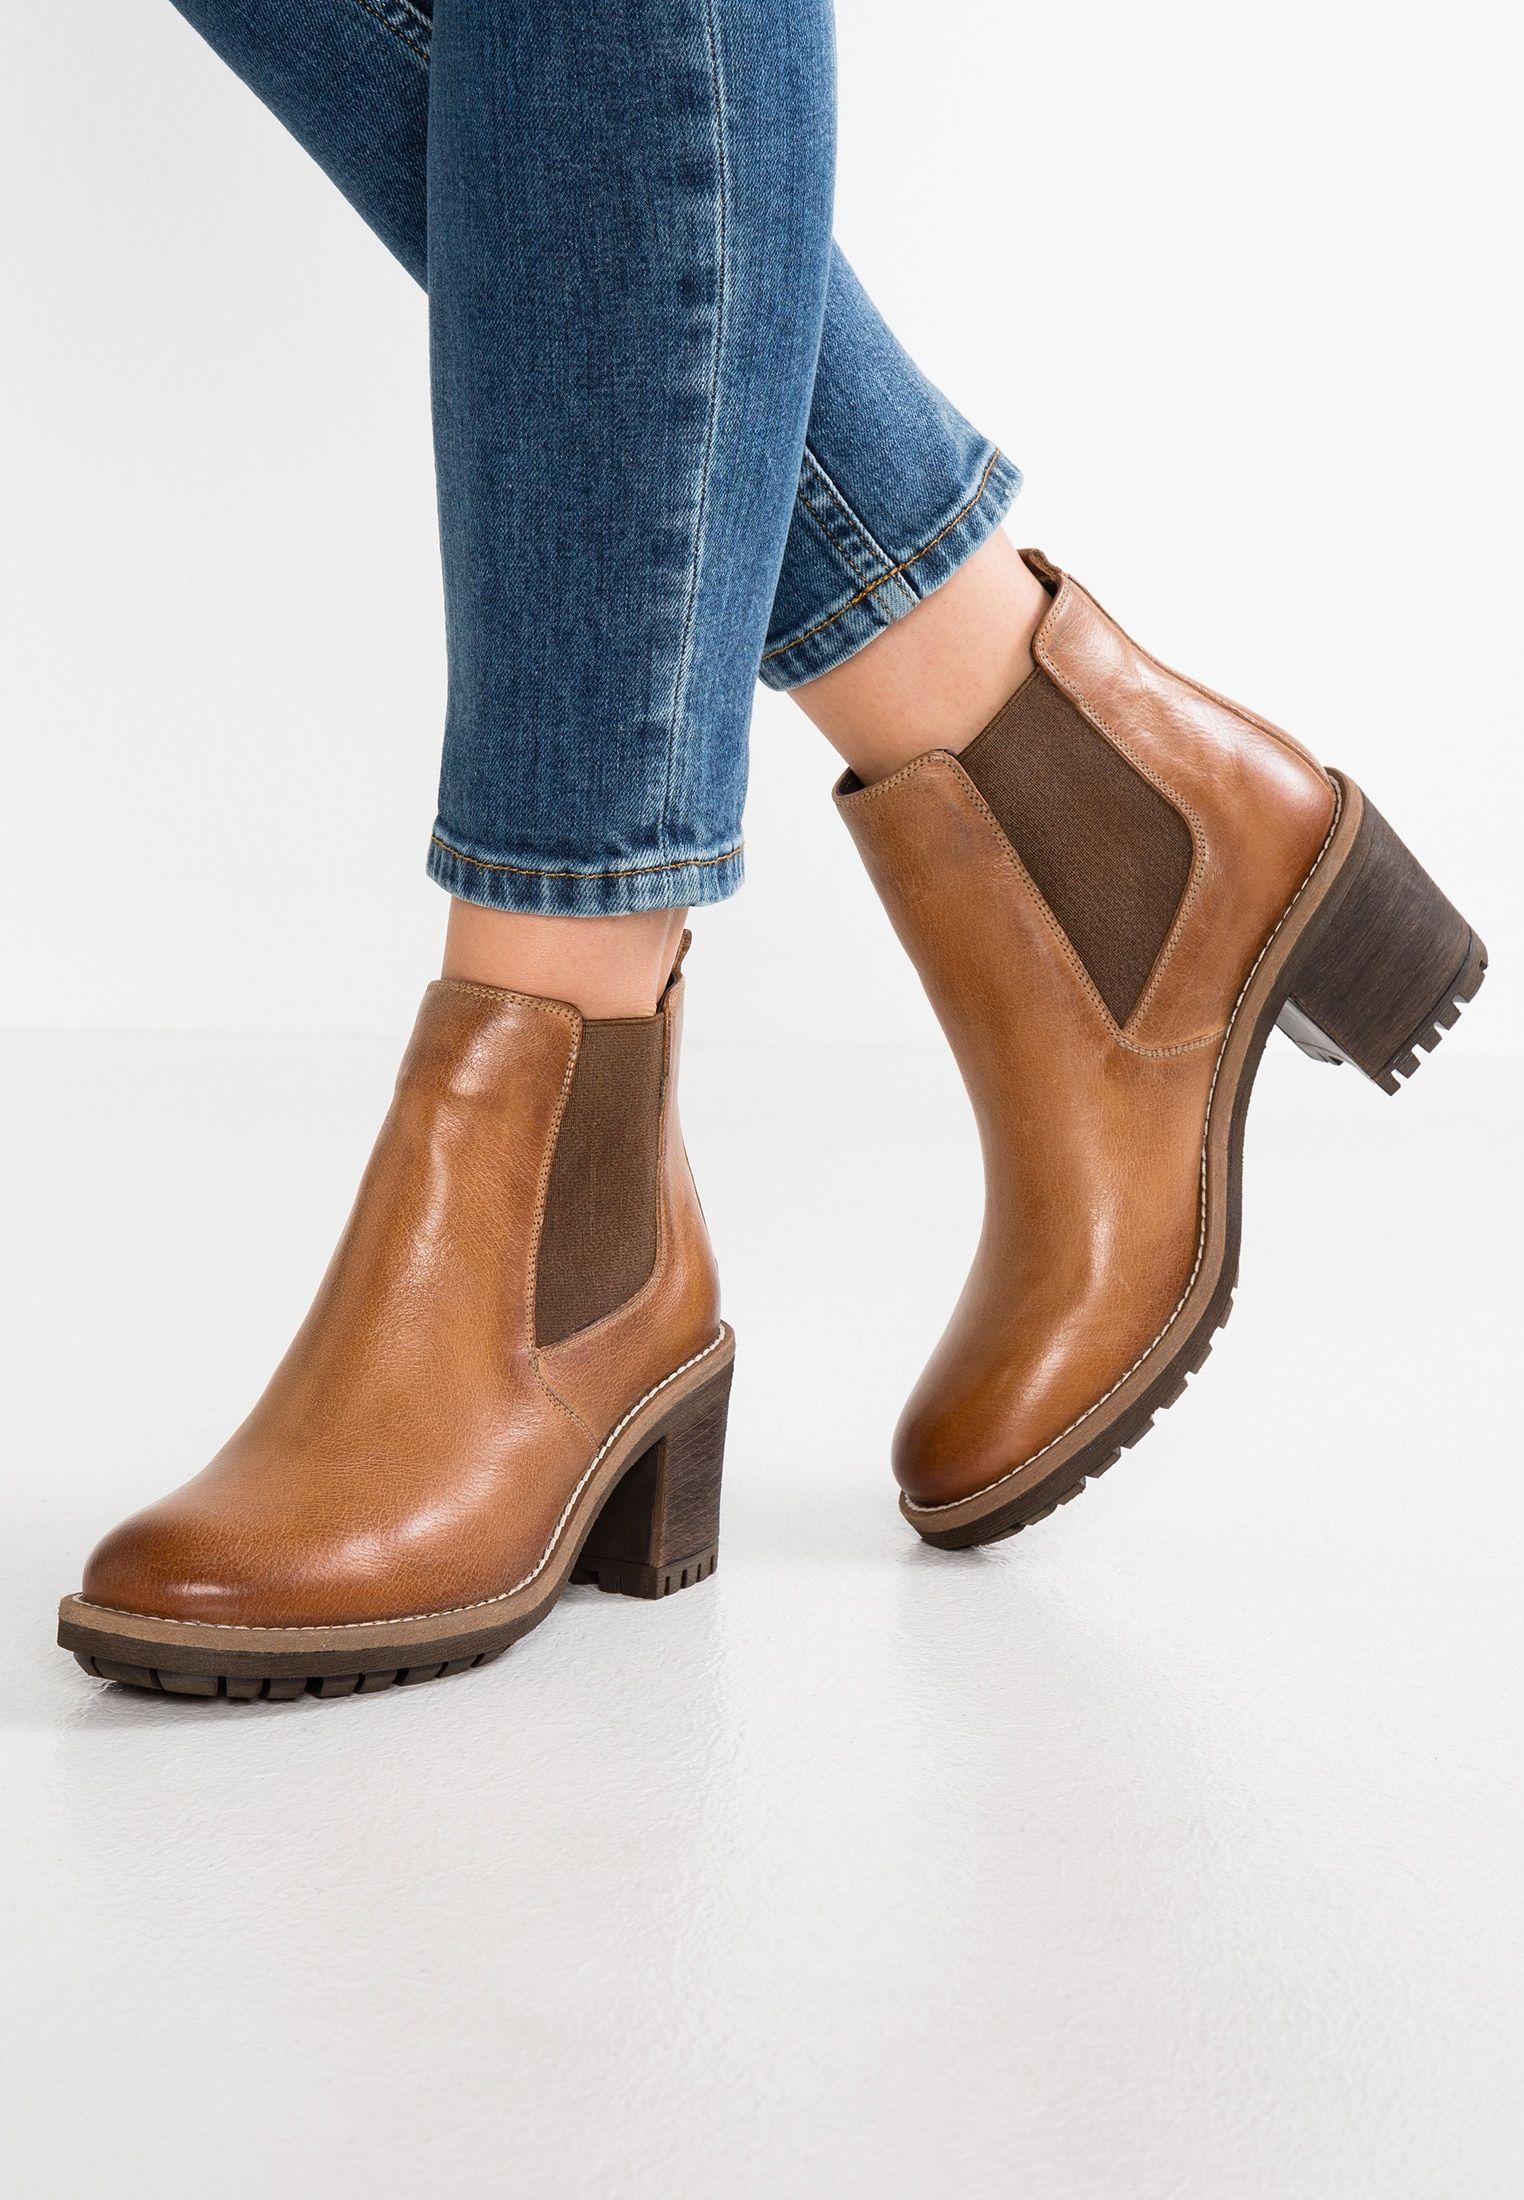 Boots Boots à à cognacWinter 18PinterestWinter talons N0w8mn